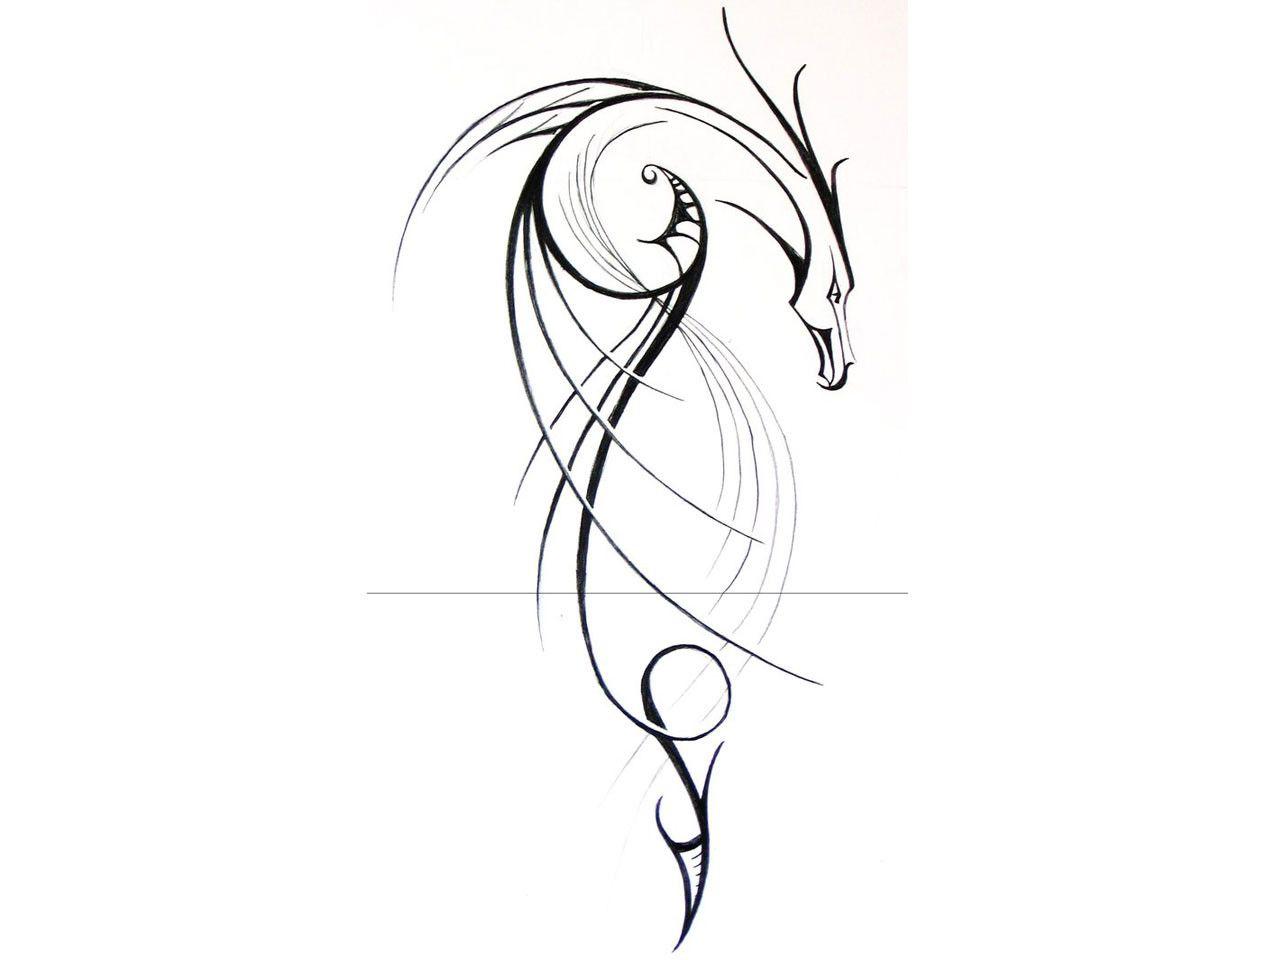 Welsh dragon tattoo designs - Simple Diamond Tattoo Designs Wallpaper Dragon Tattoos